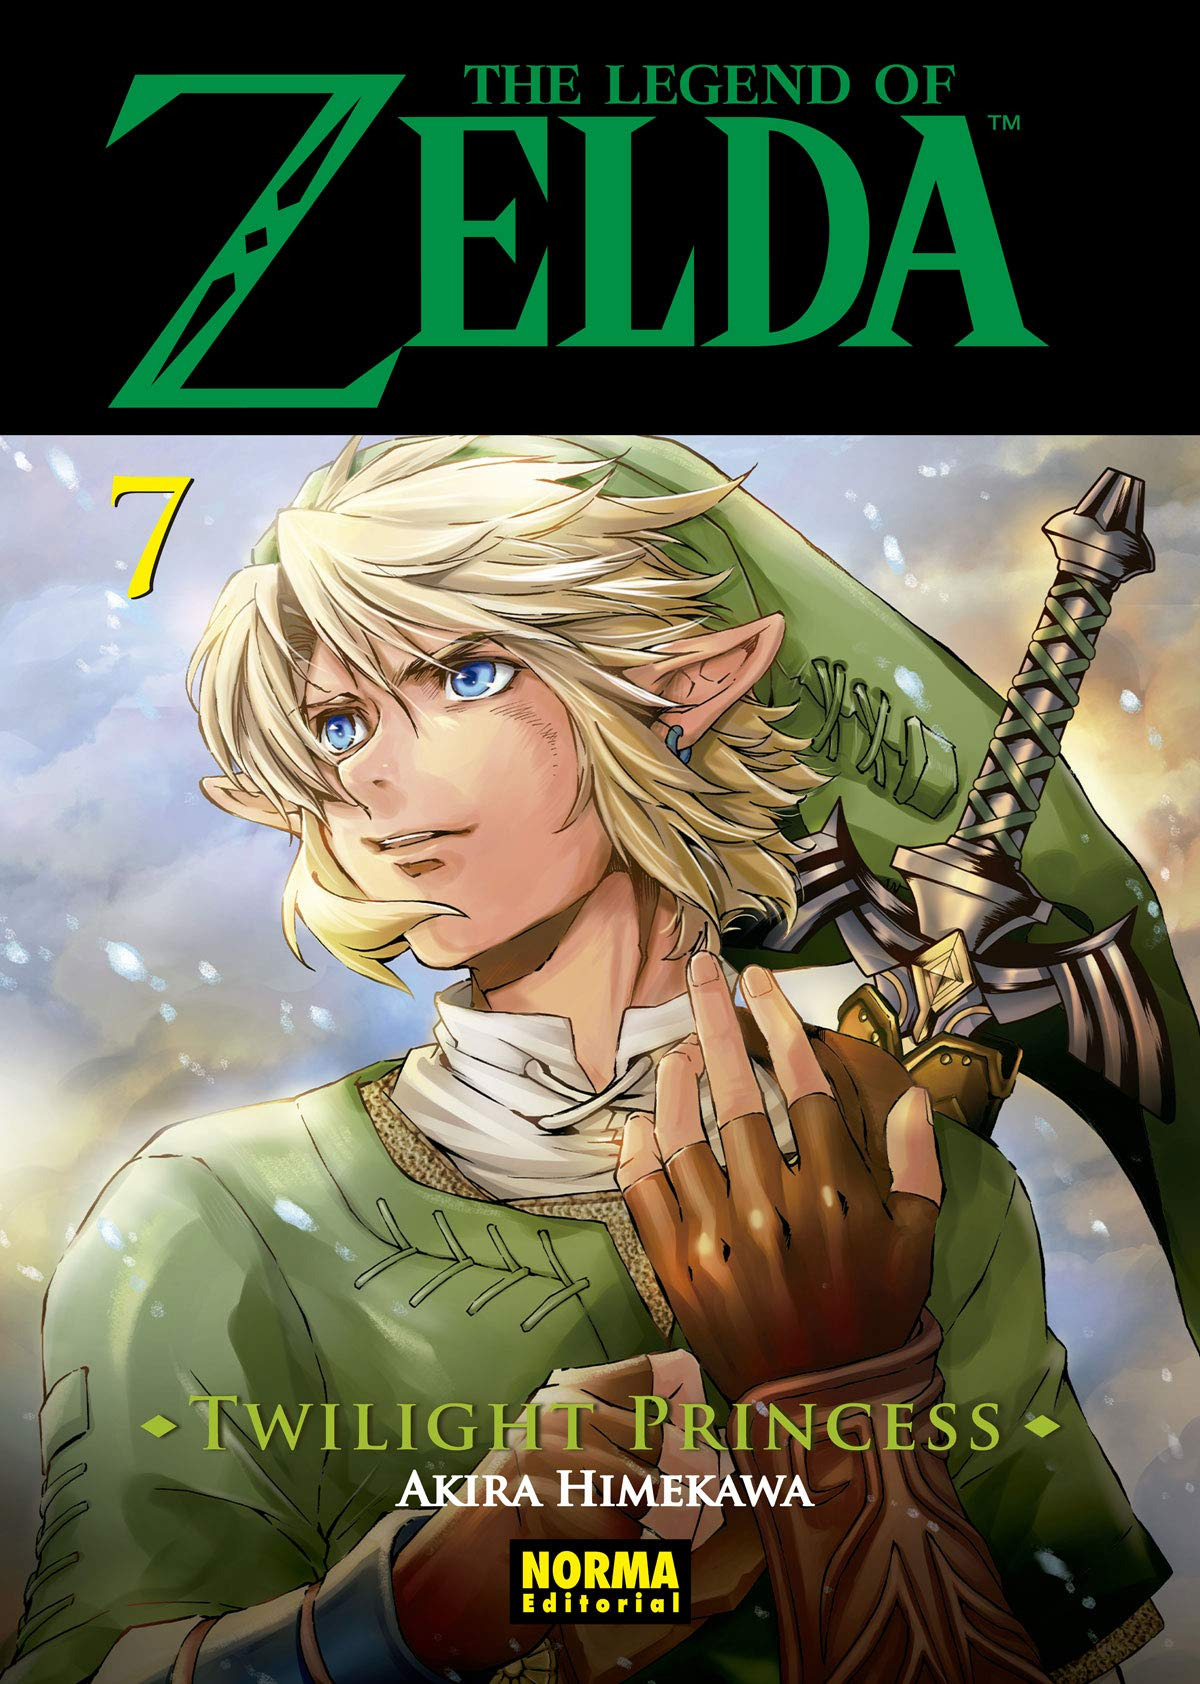 THE LEGEND OF ZELDA: TWILIGHT PRINCESS 07